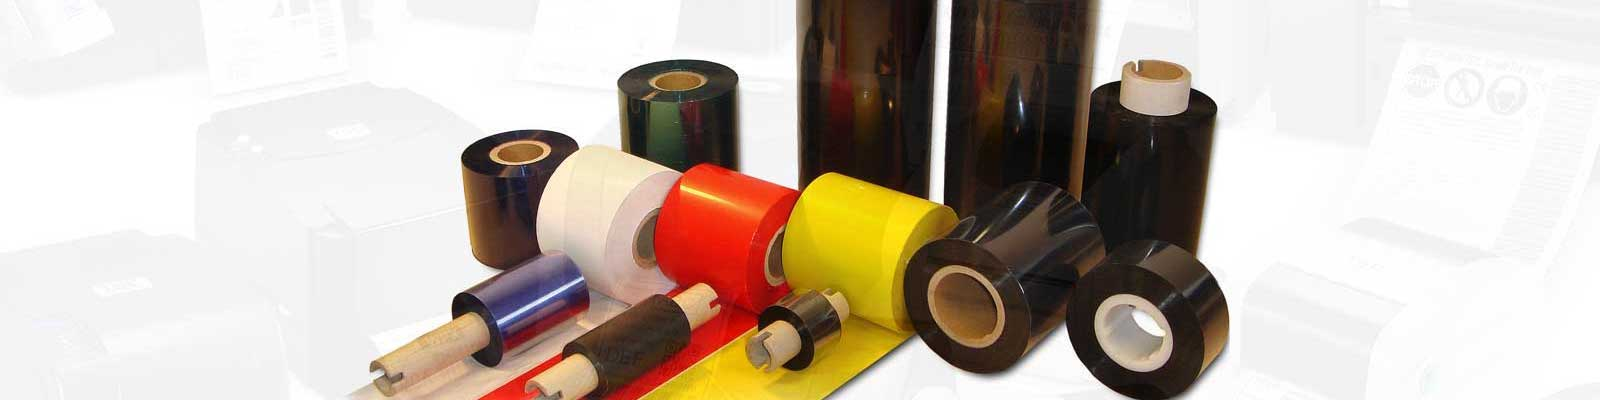 Ribbon Impresoras Sato